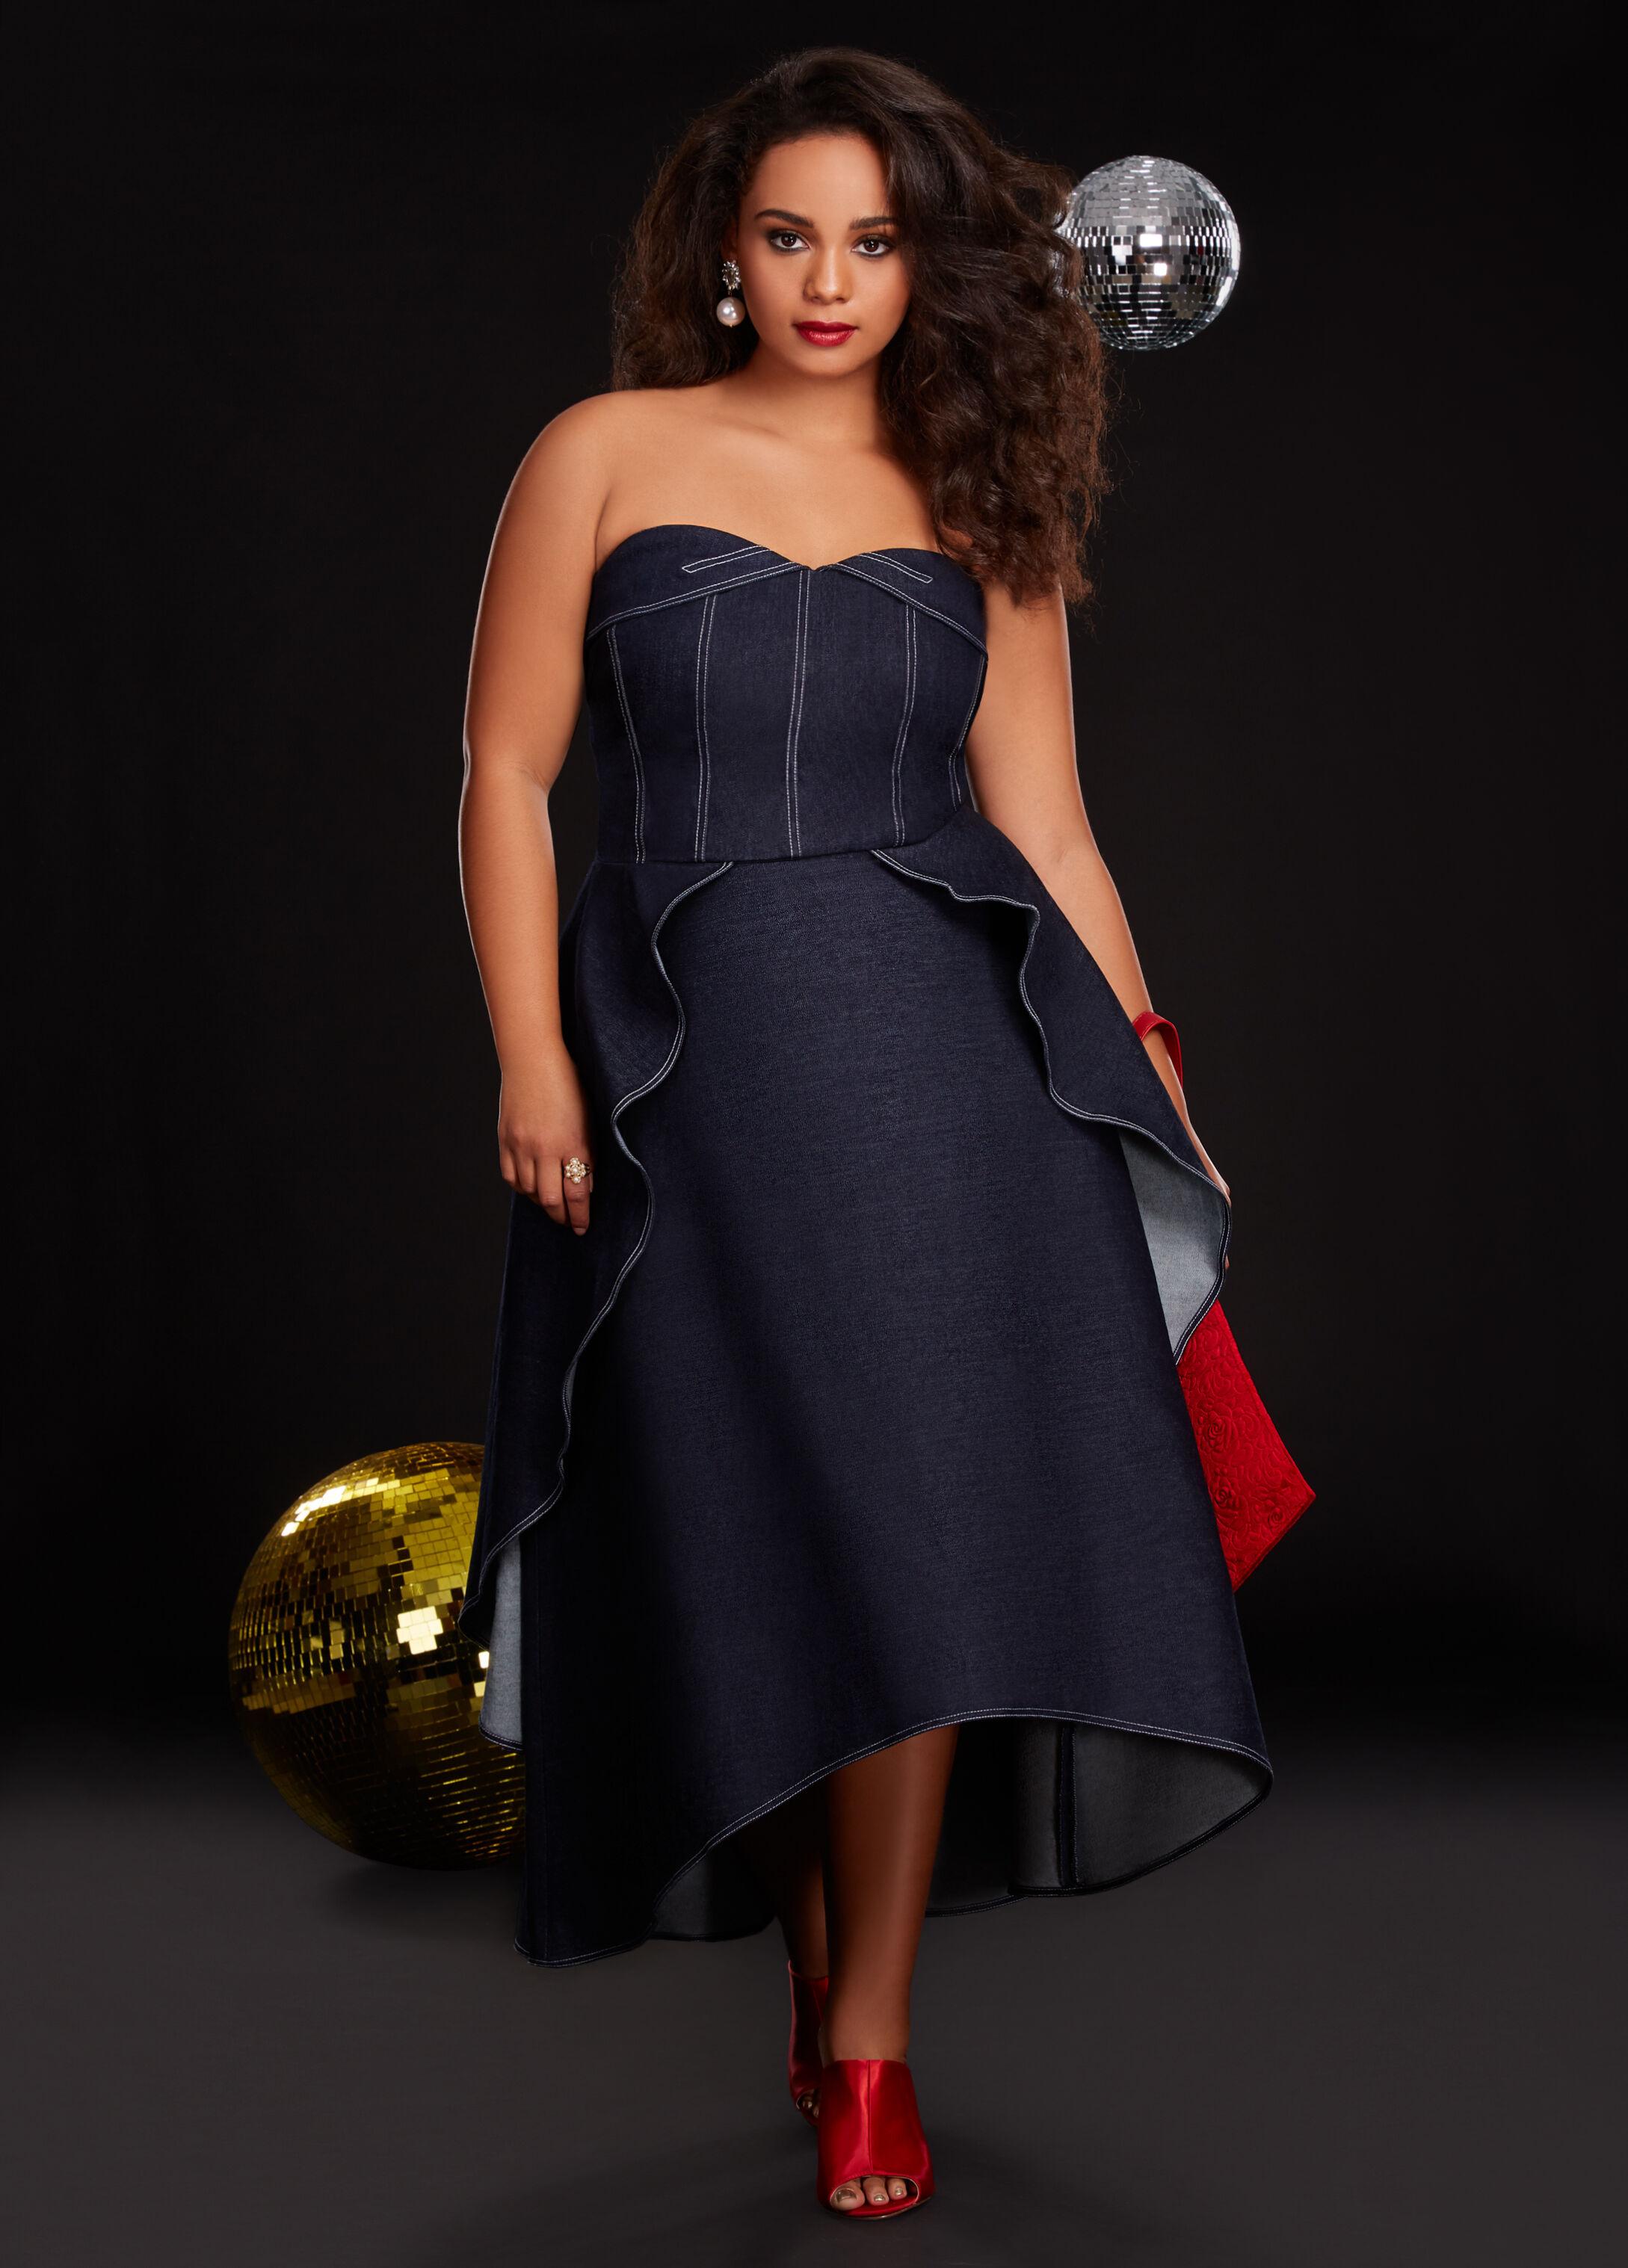 Plus Size Outfits - Denim Dress with Satin Heel